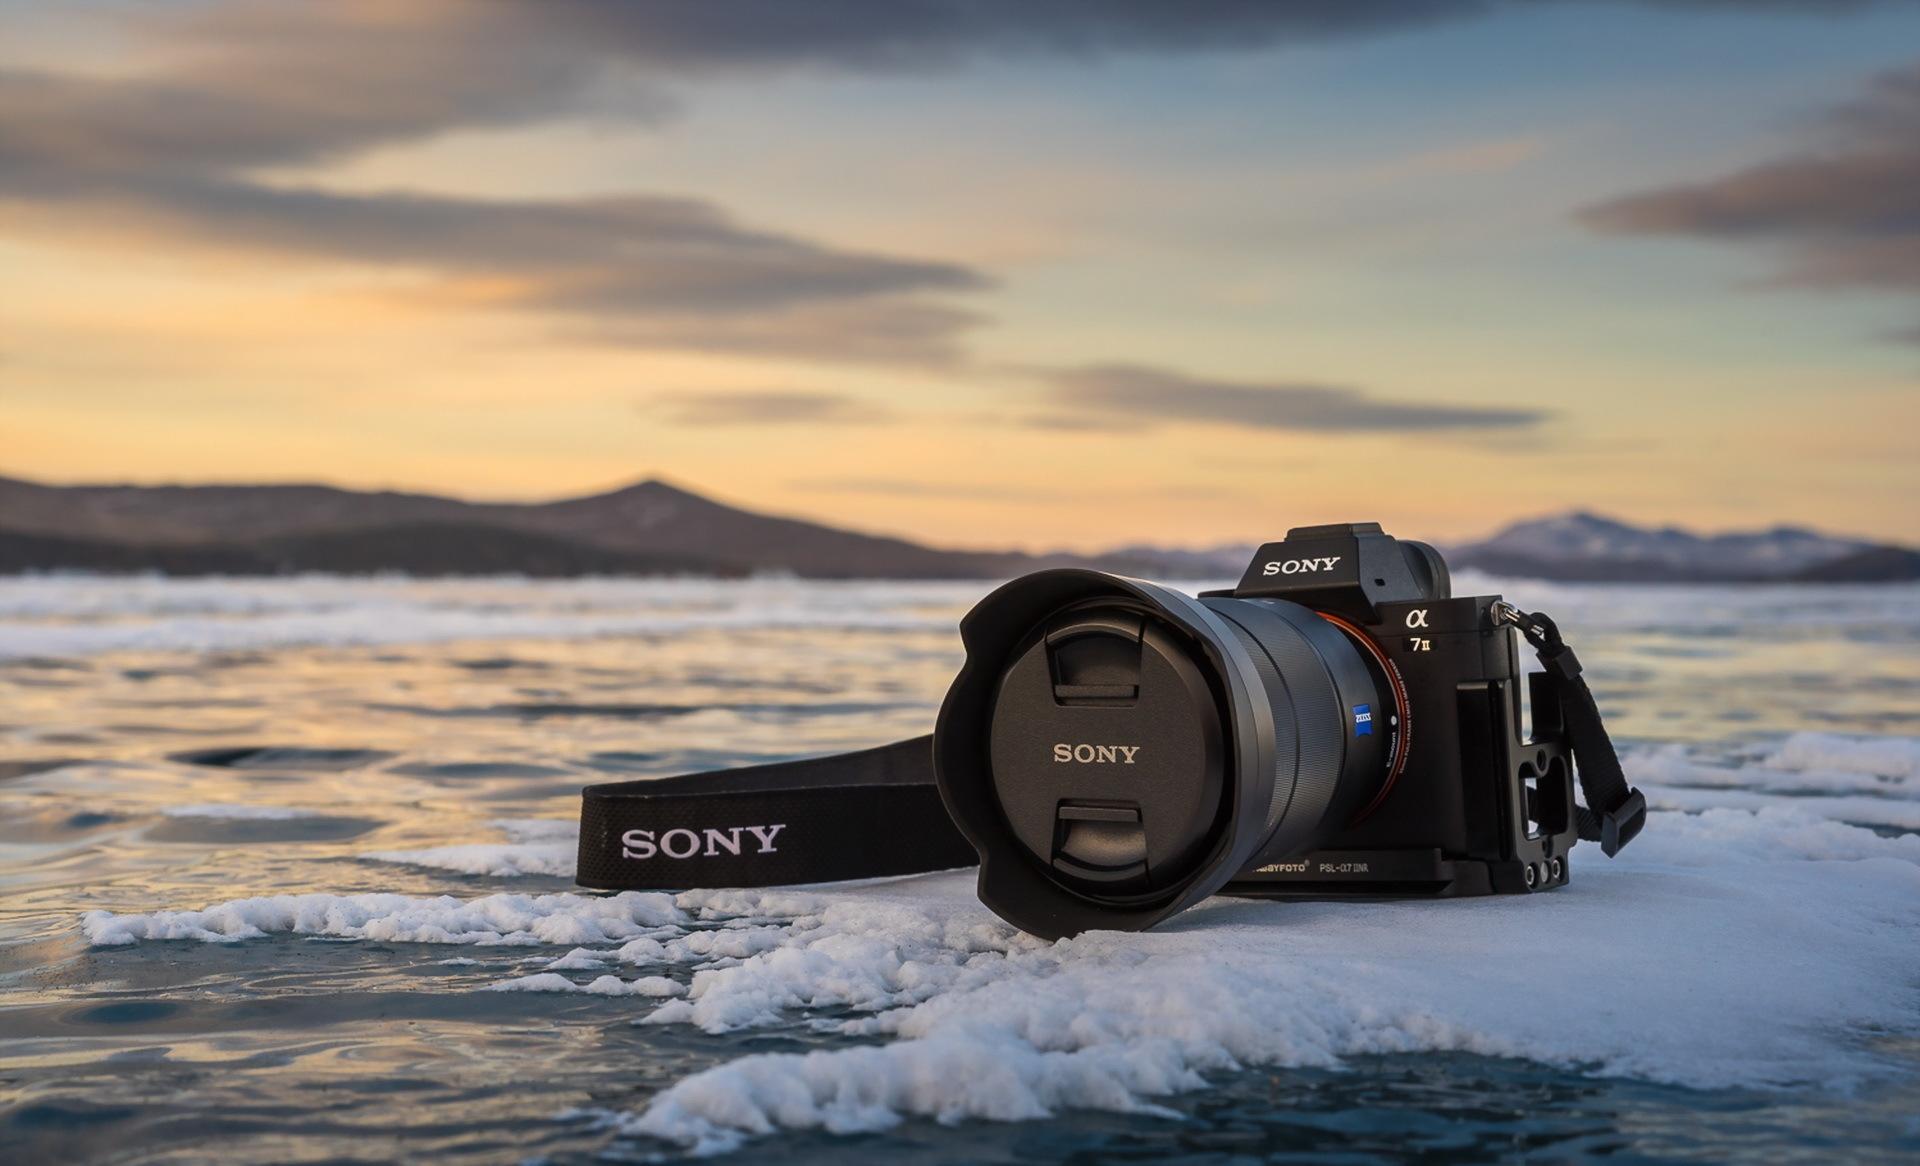 Фотоаппарат в воде картинки